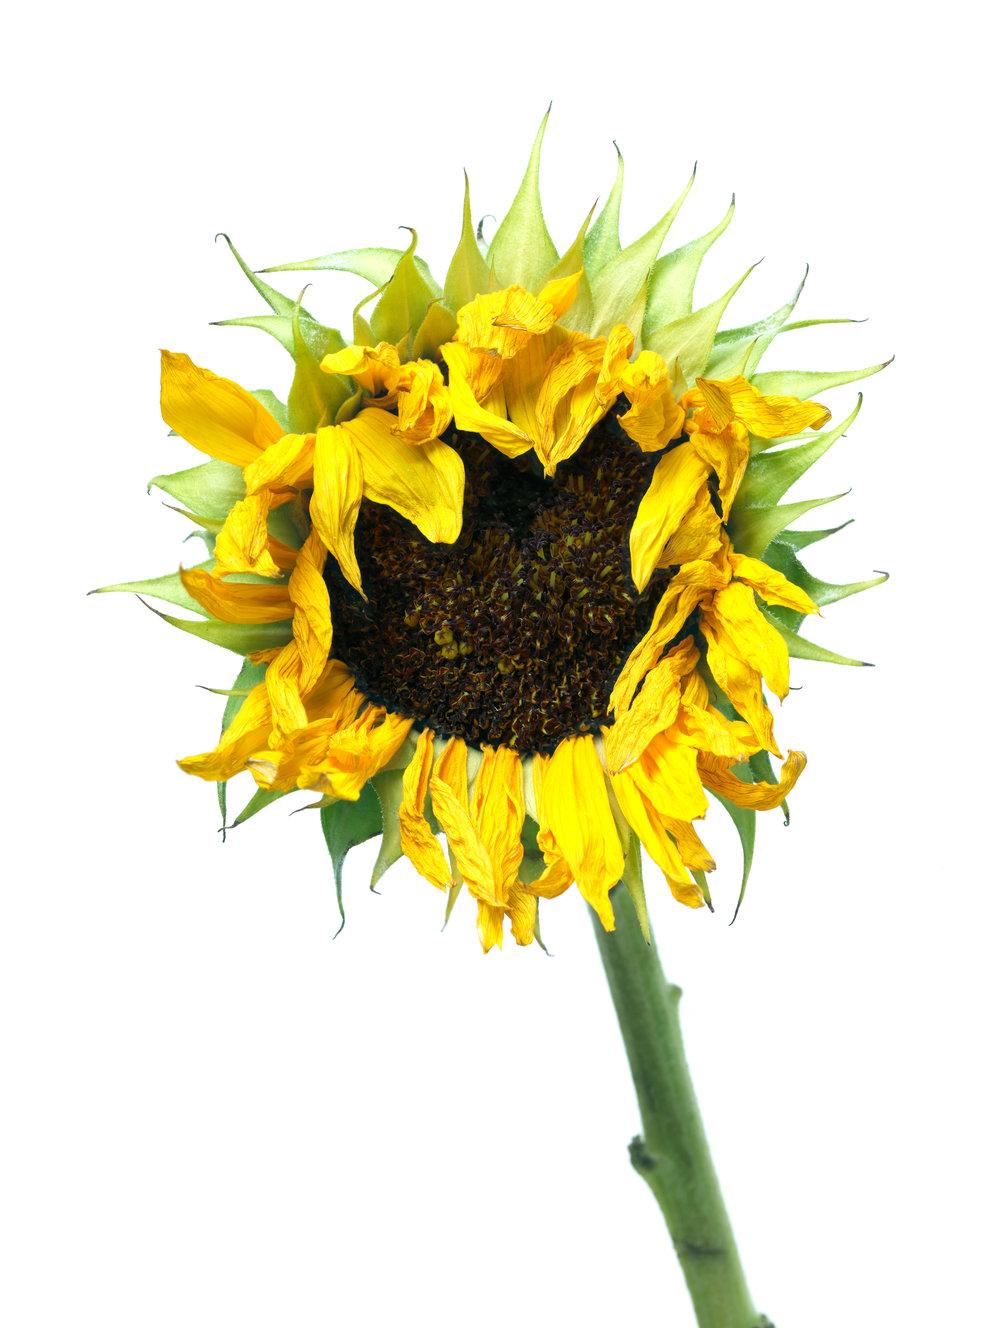 Sunflower #7